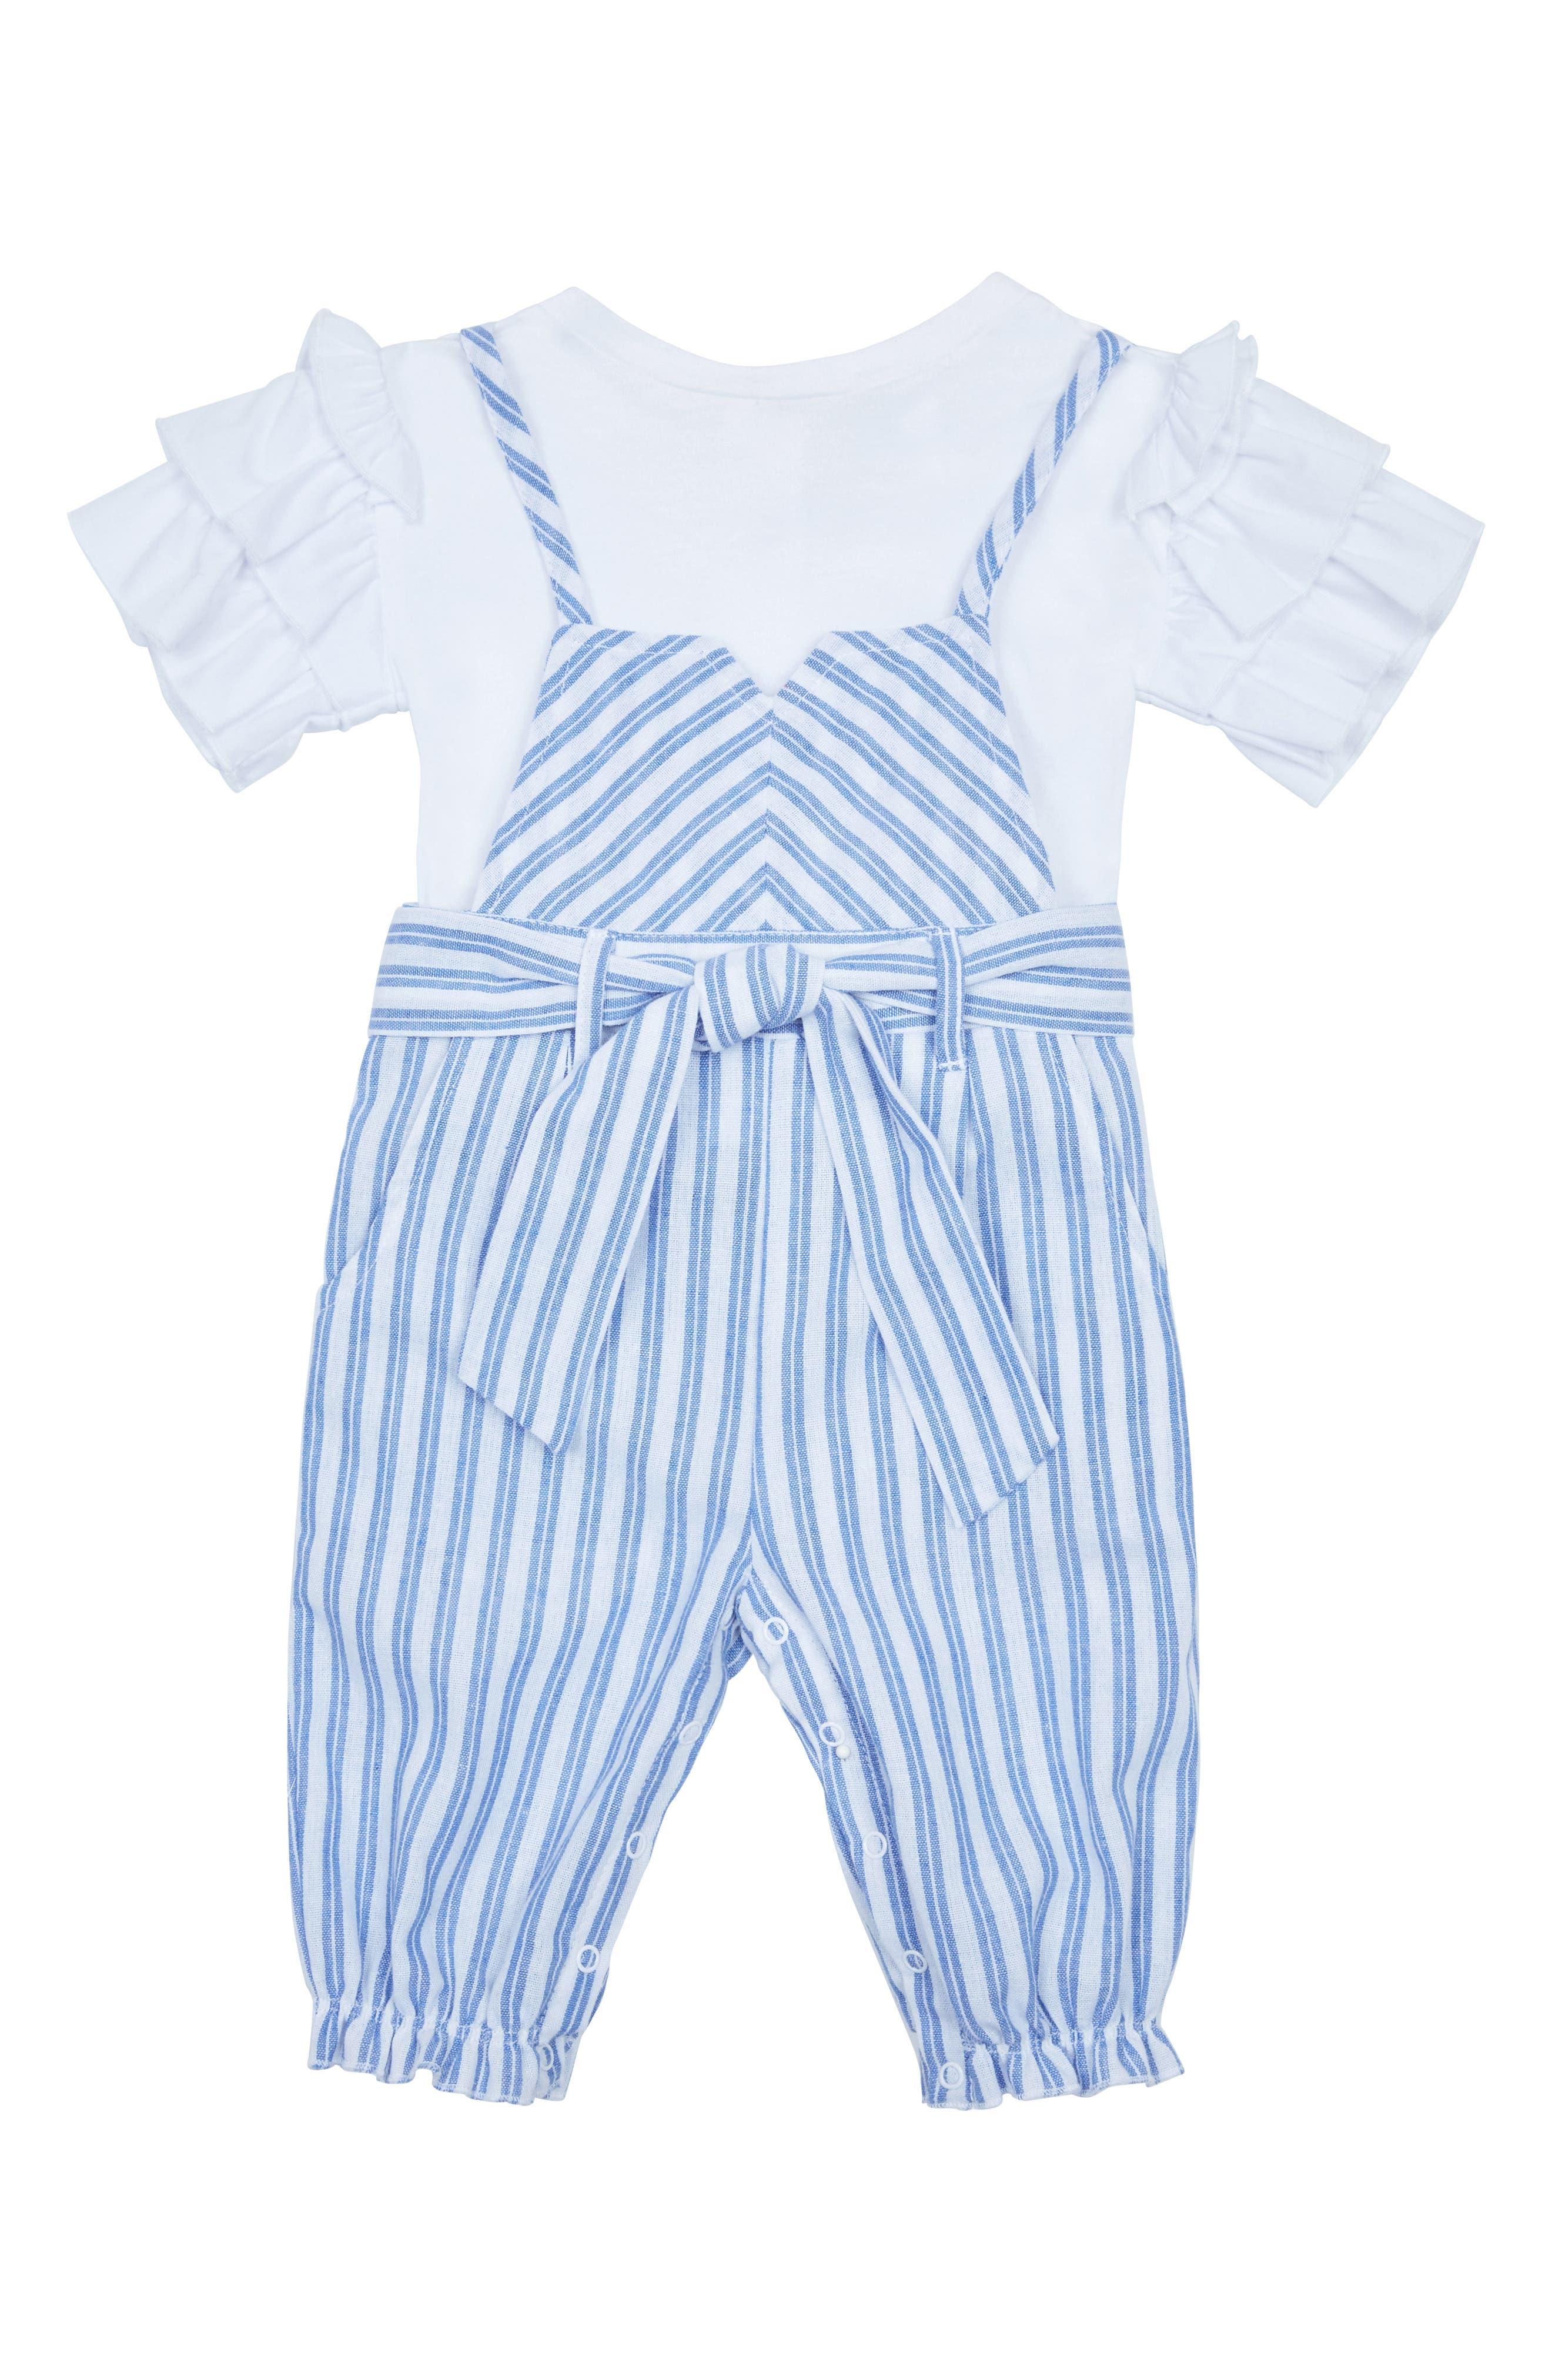 Toddler Girls Habitual Girl Genesis Stripe Overall Set